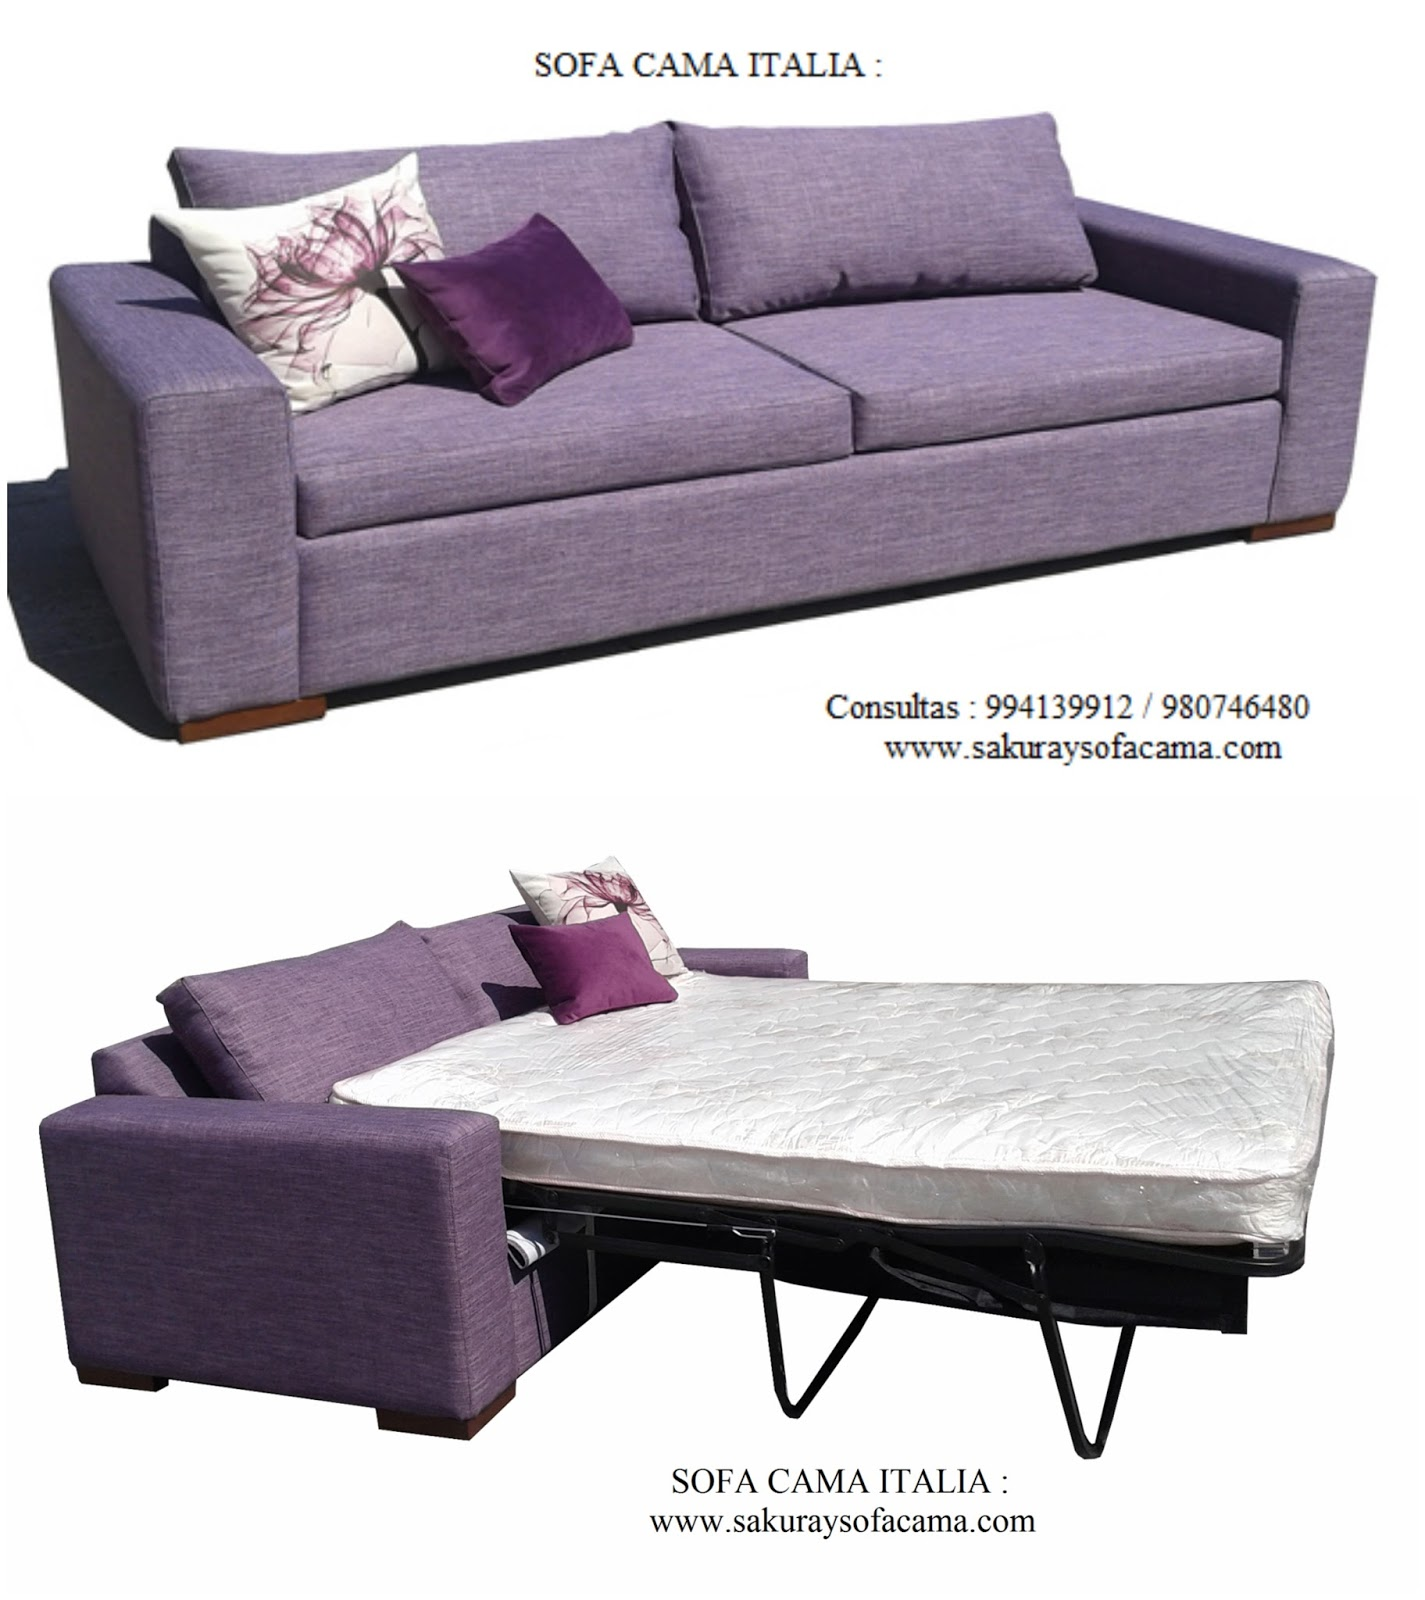 Mueble peru sakuray sofa cama italia for Mueble divan cama